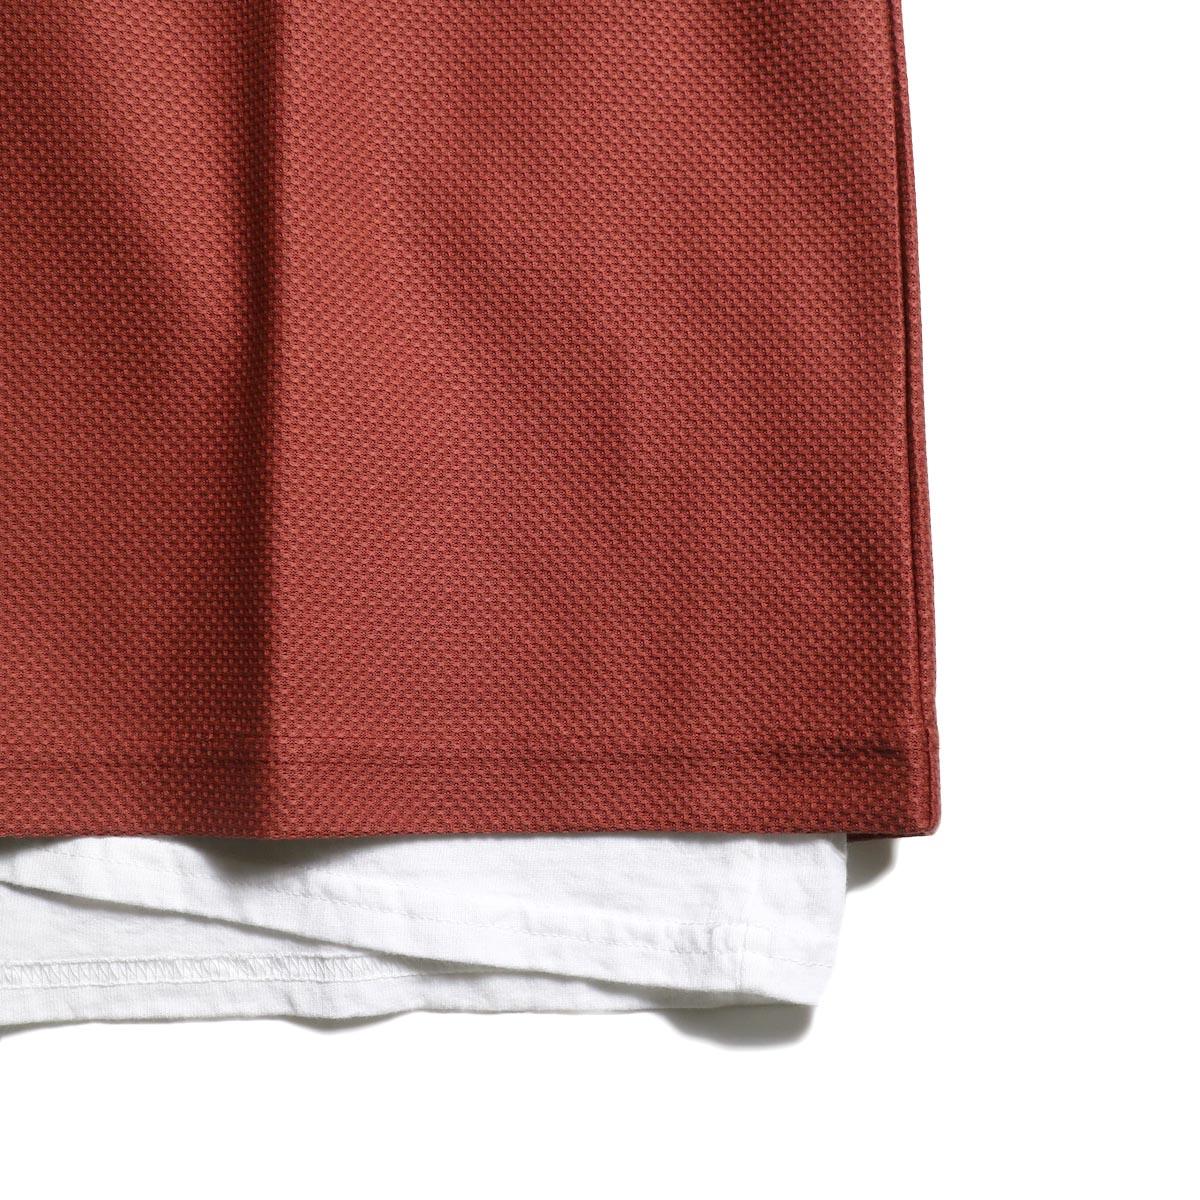 UNIVERSAL PRODUCTS /  PIQUE VEST (Smoke Orange)裾